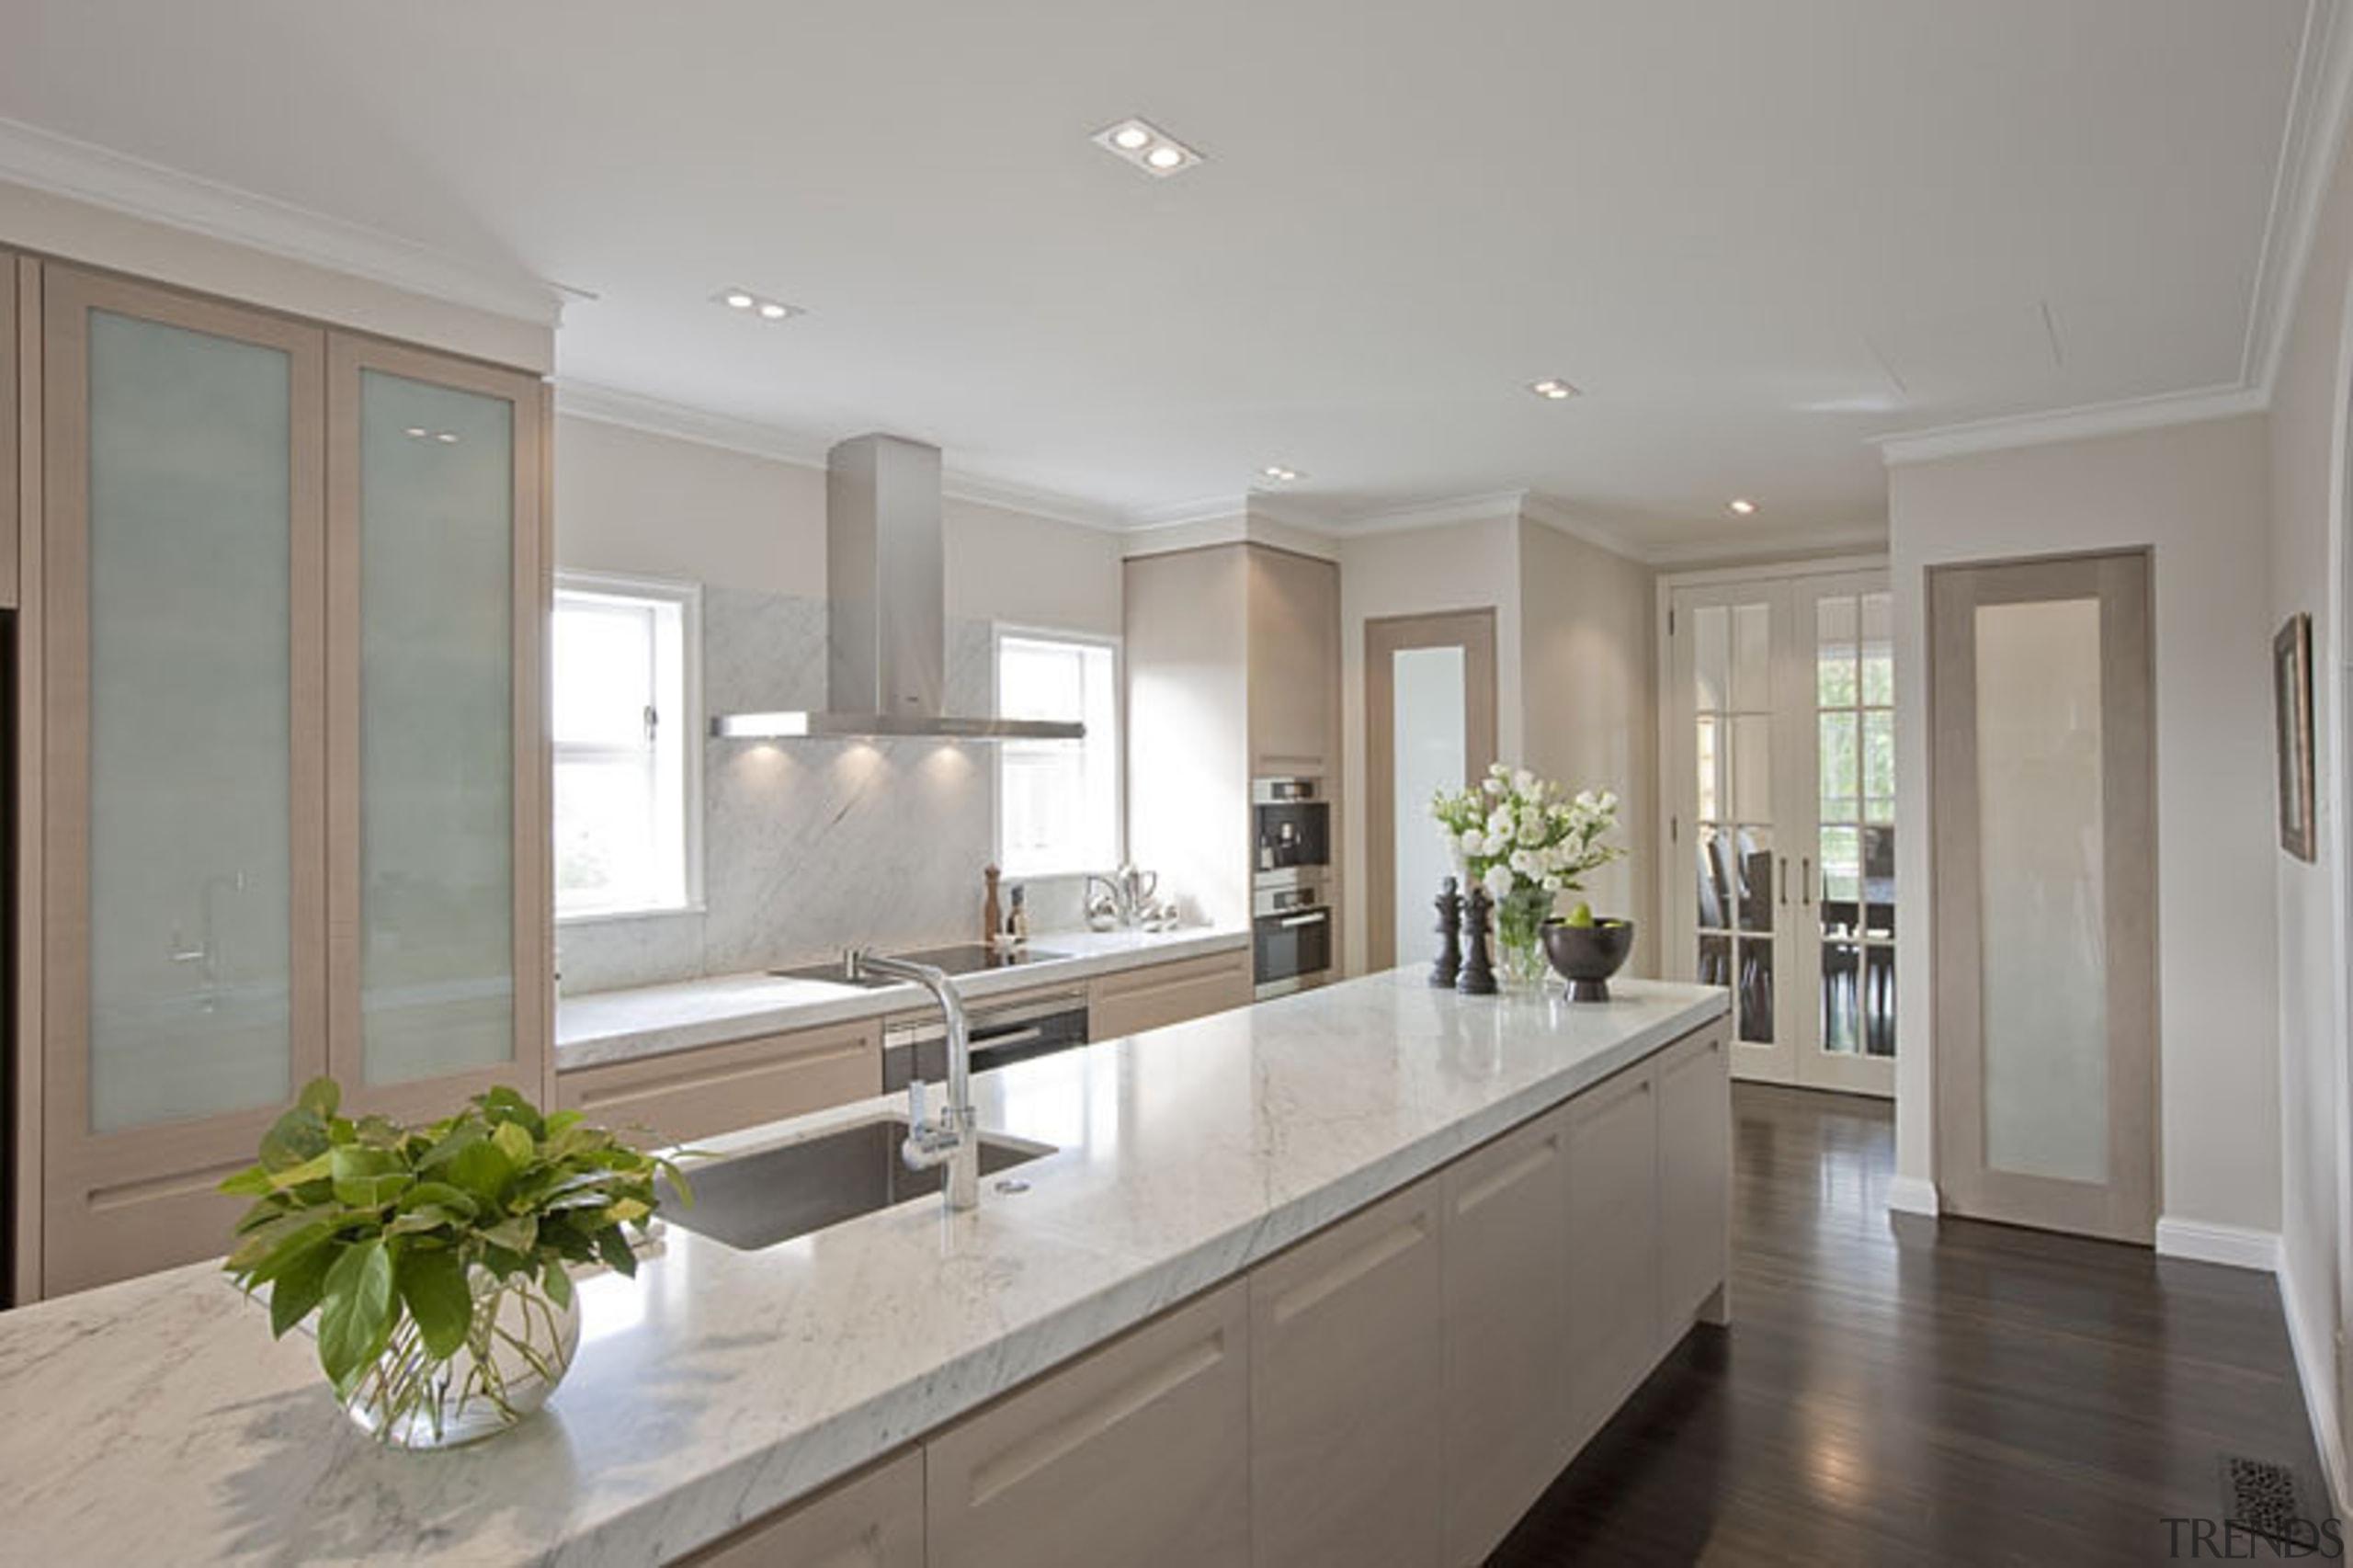 Remuera - countertop | cuisine classique | estate countertop, cuisine classique, estate, home, interior design, kitchen, property, real estate, room, window, gray